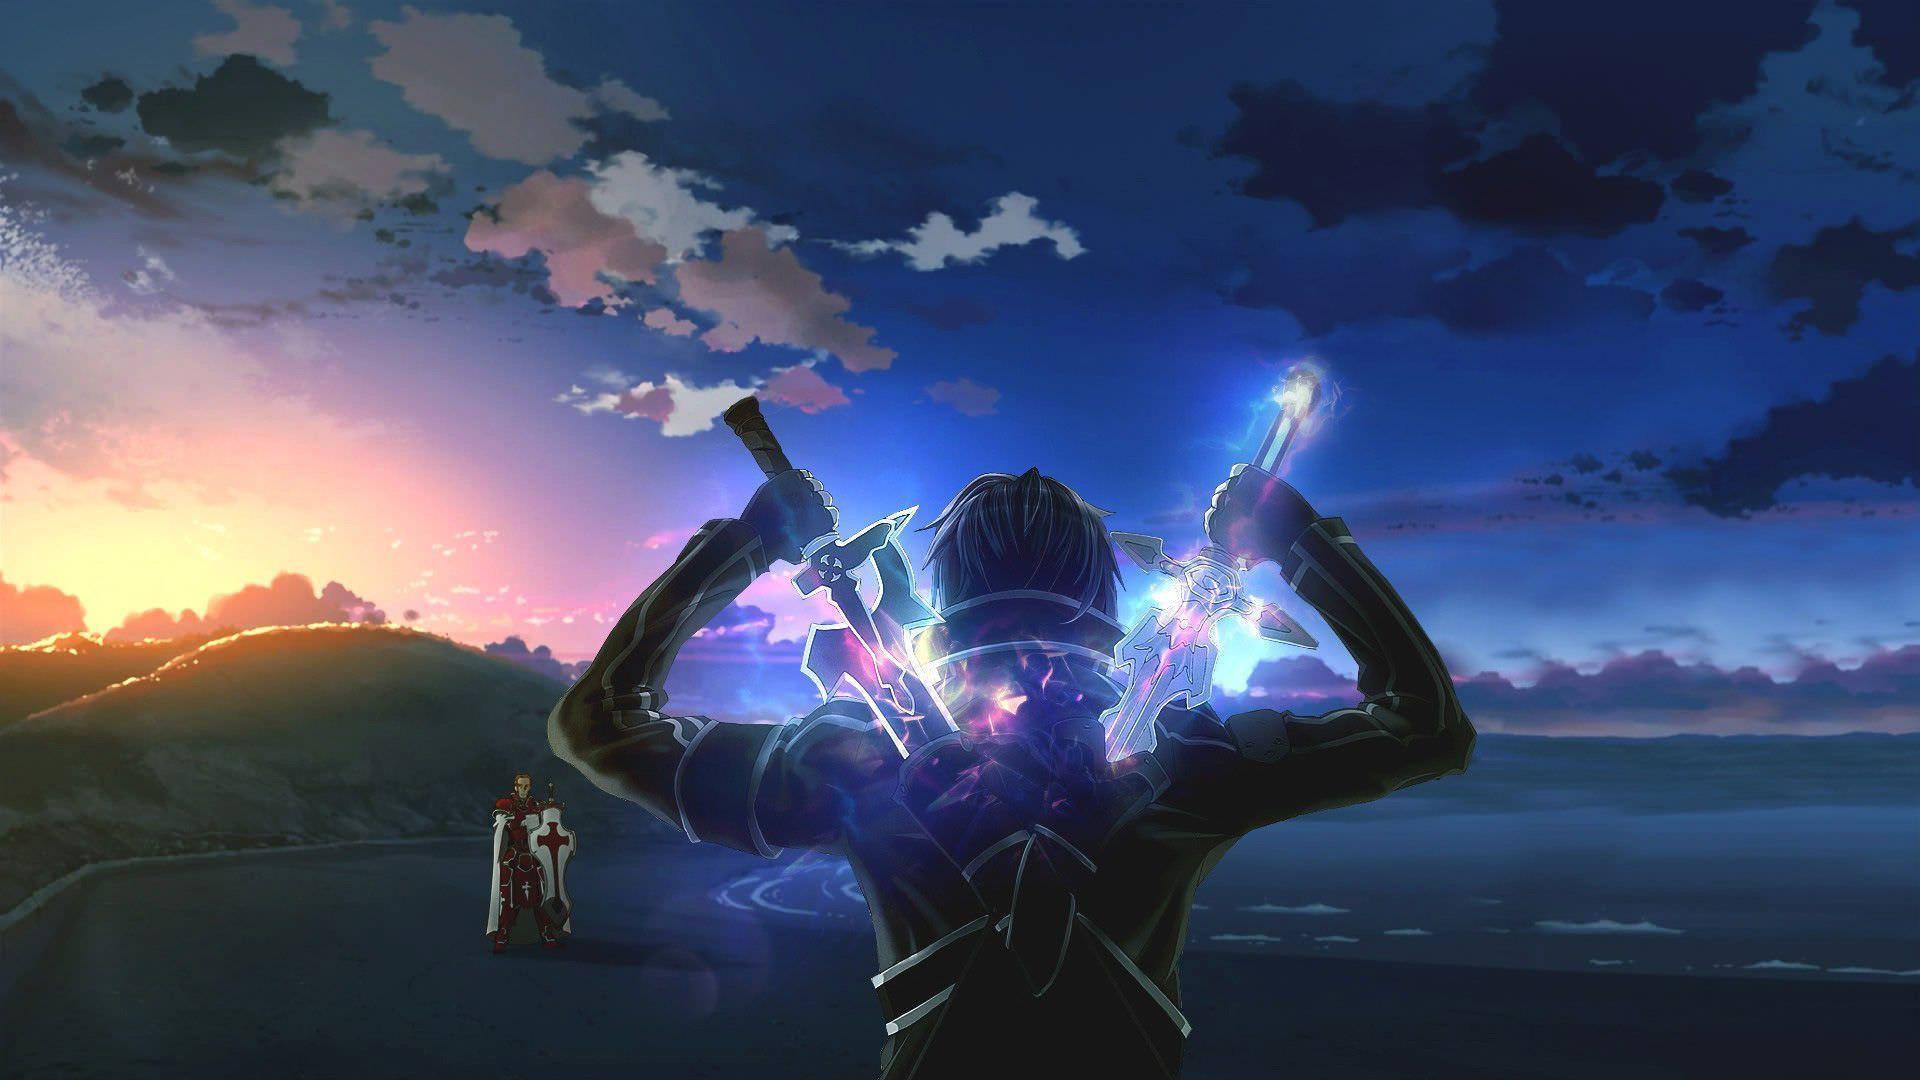 High Definition Mobile Phone And Desktop Wallpapers Sword Art Online Wallpaper Sword Art Online Kirito Sword Art